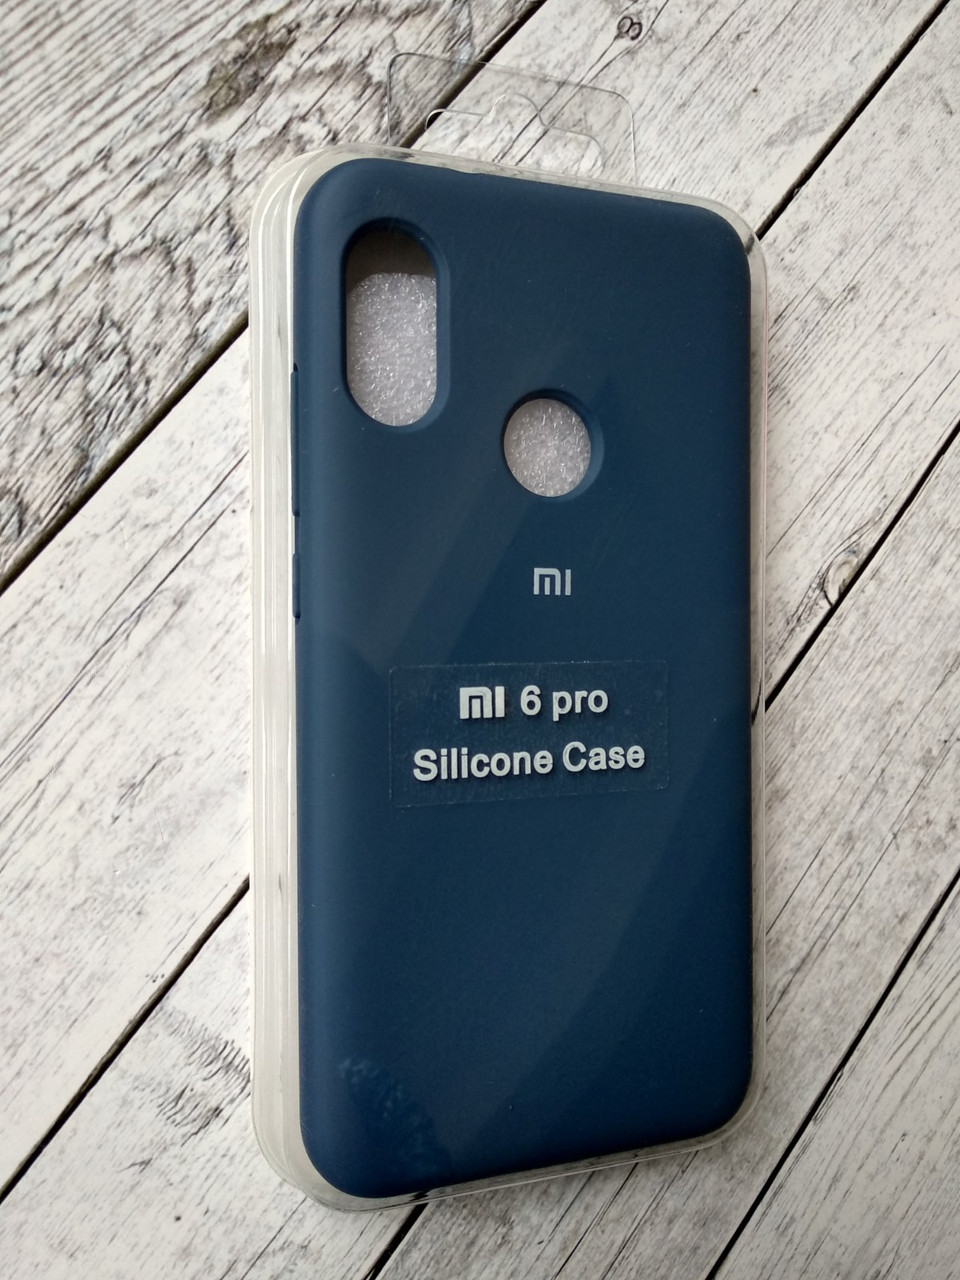 "Чехол Xiaomi Redmi 6 Pro/Mi A2 Lite Silicon Original Full №13 dark blue ""Спец предложение!"""